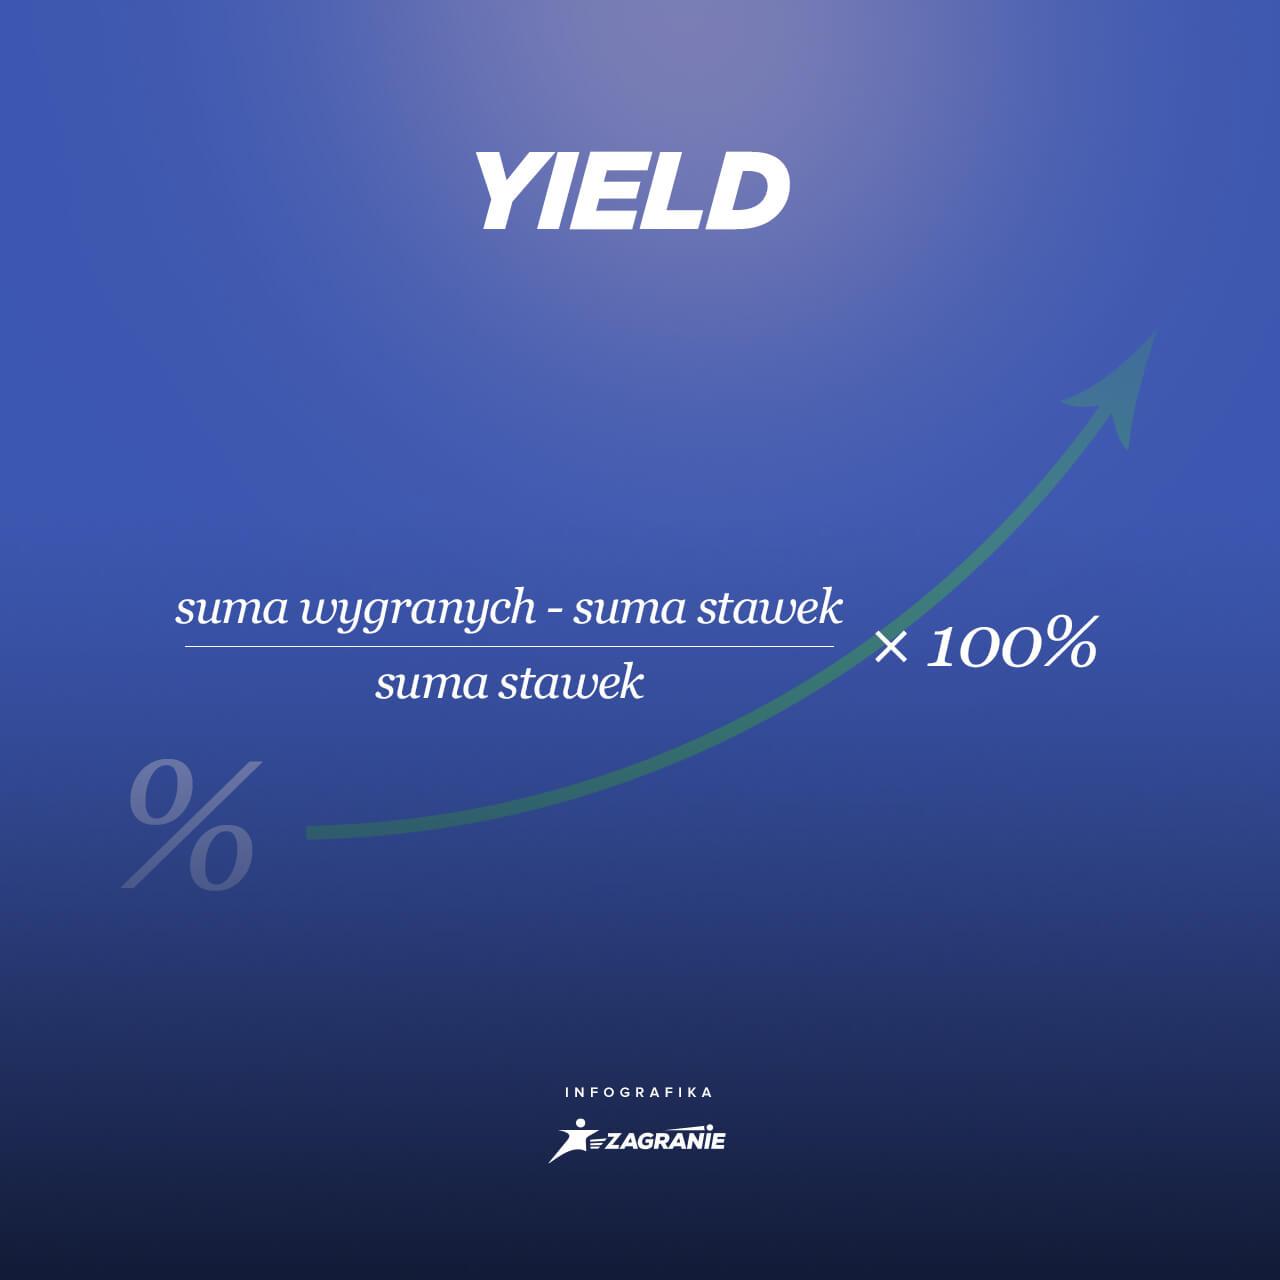 wzór na yield